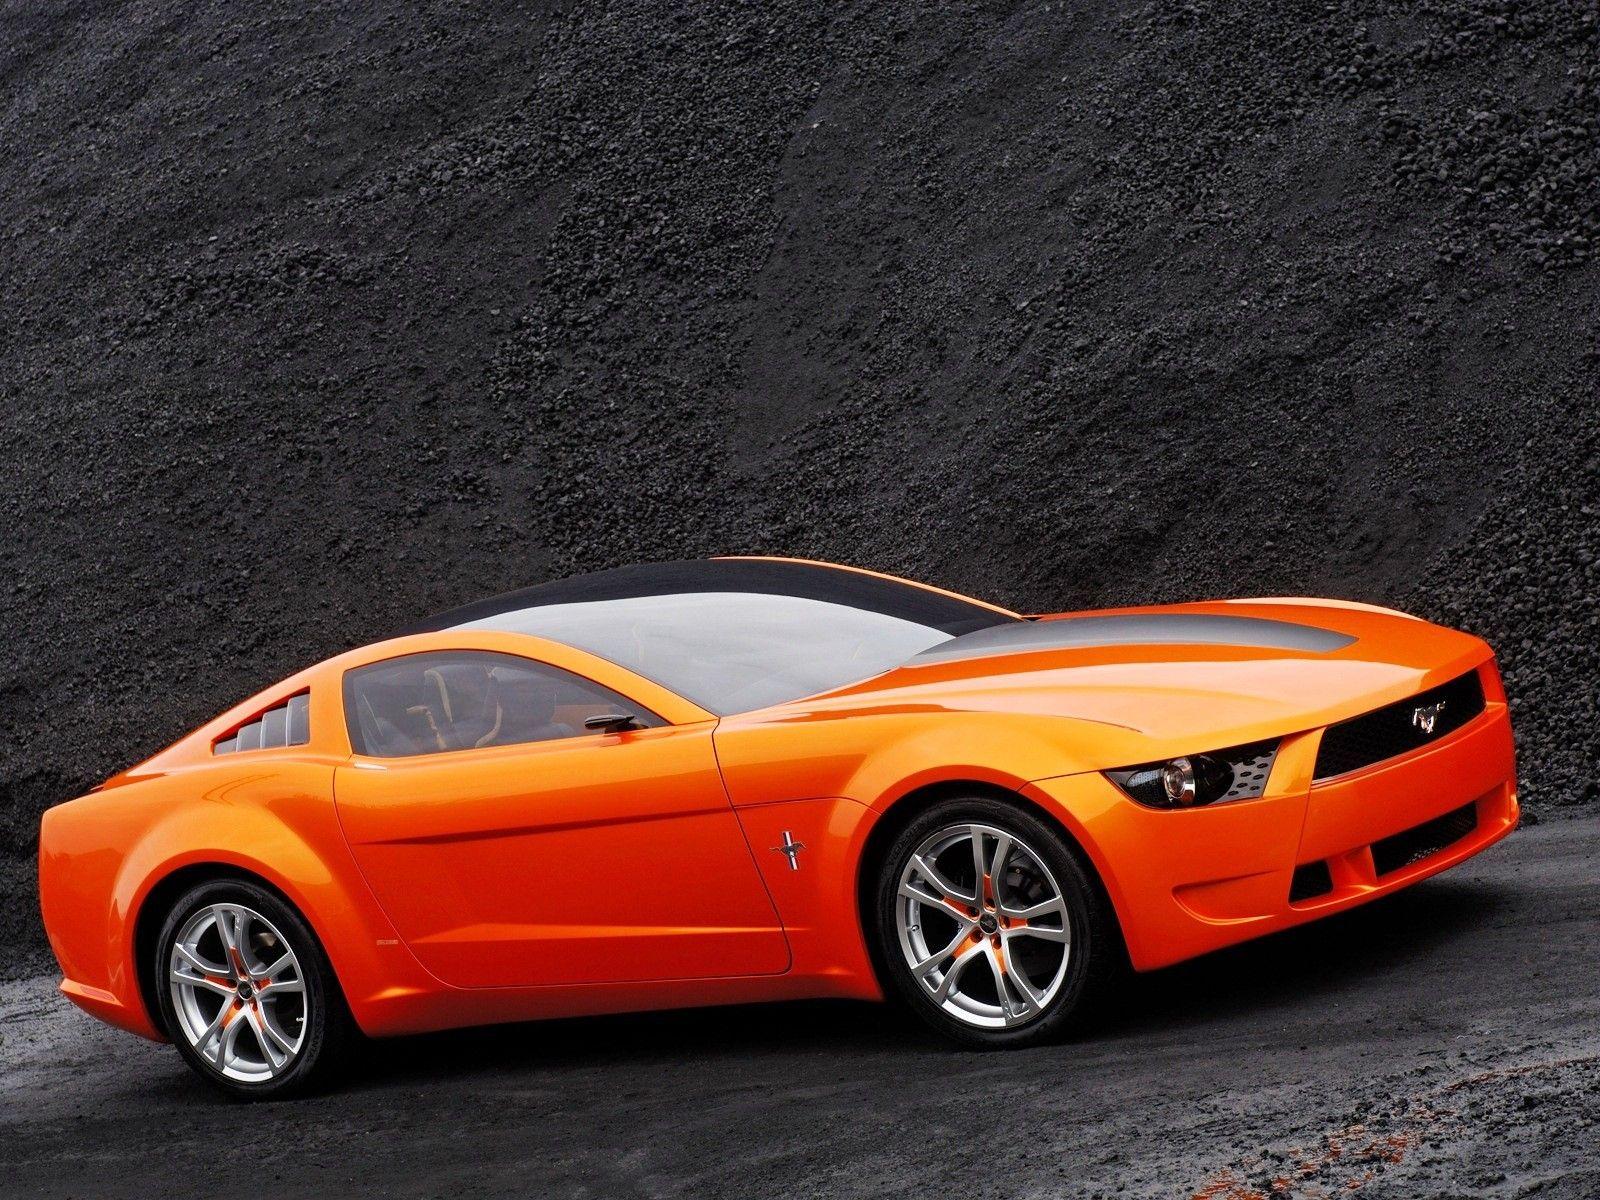 Orange Ford Mustang Gt New Hd Wallpaper Ford Hd Wallpaper